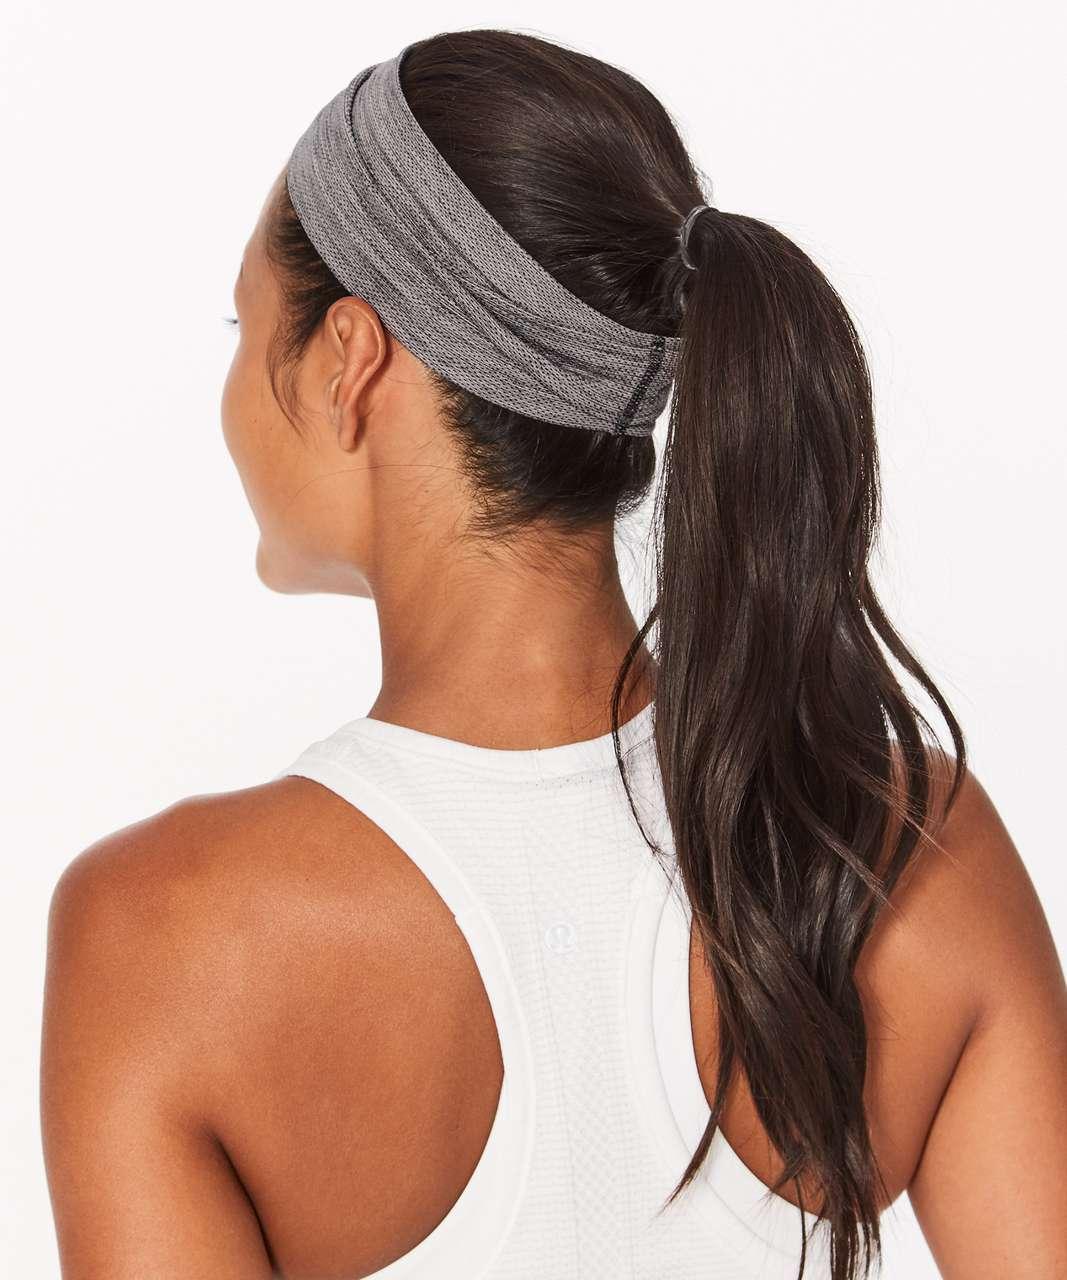 Lululemon Swiftly Headband - Slate / White